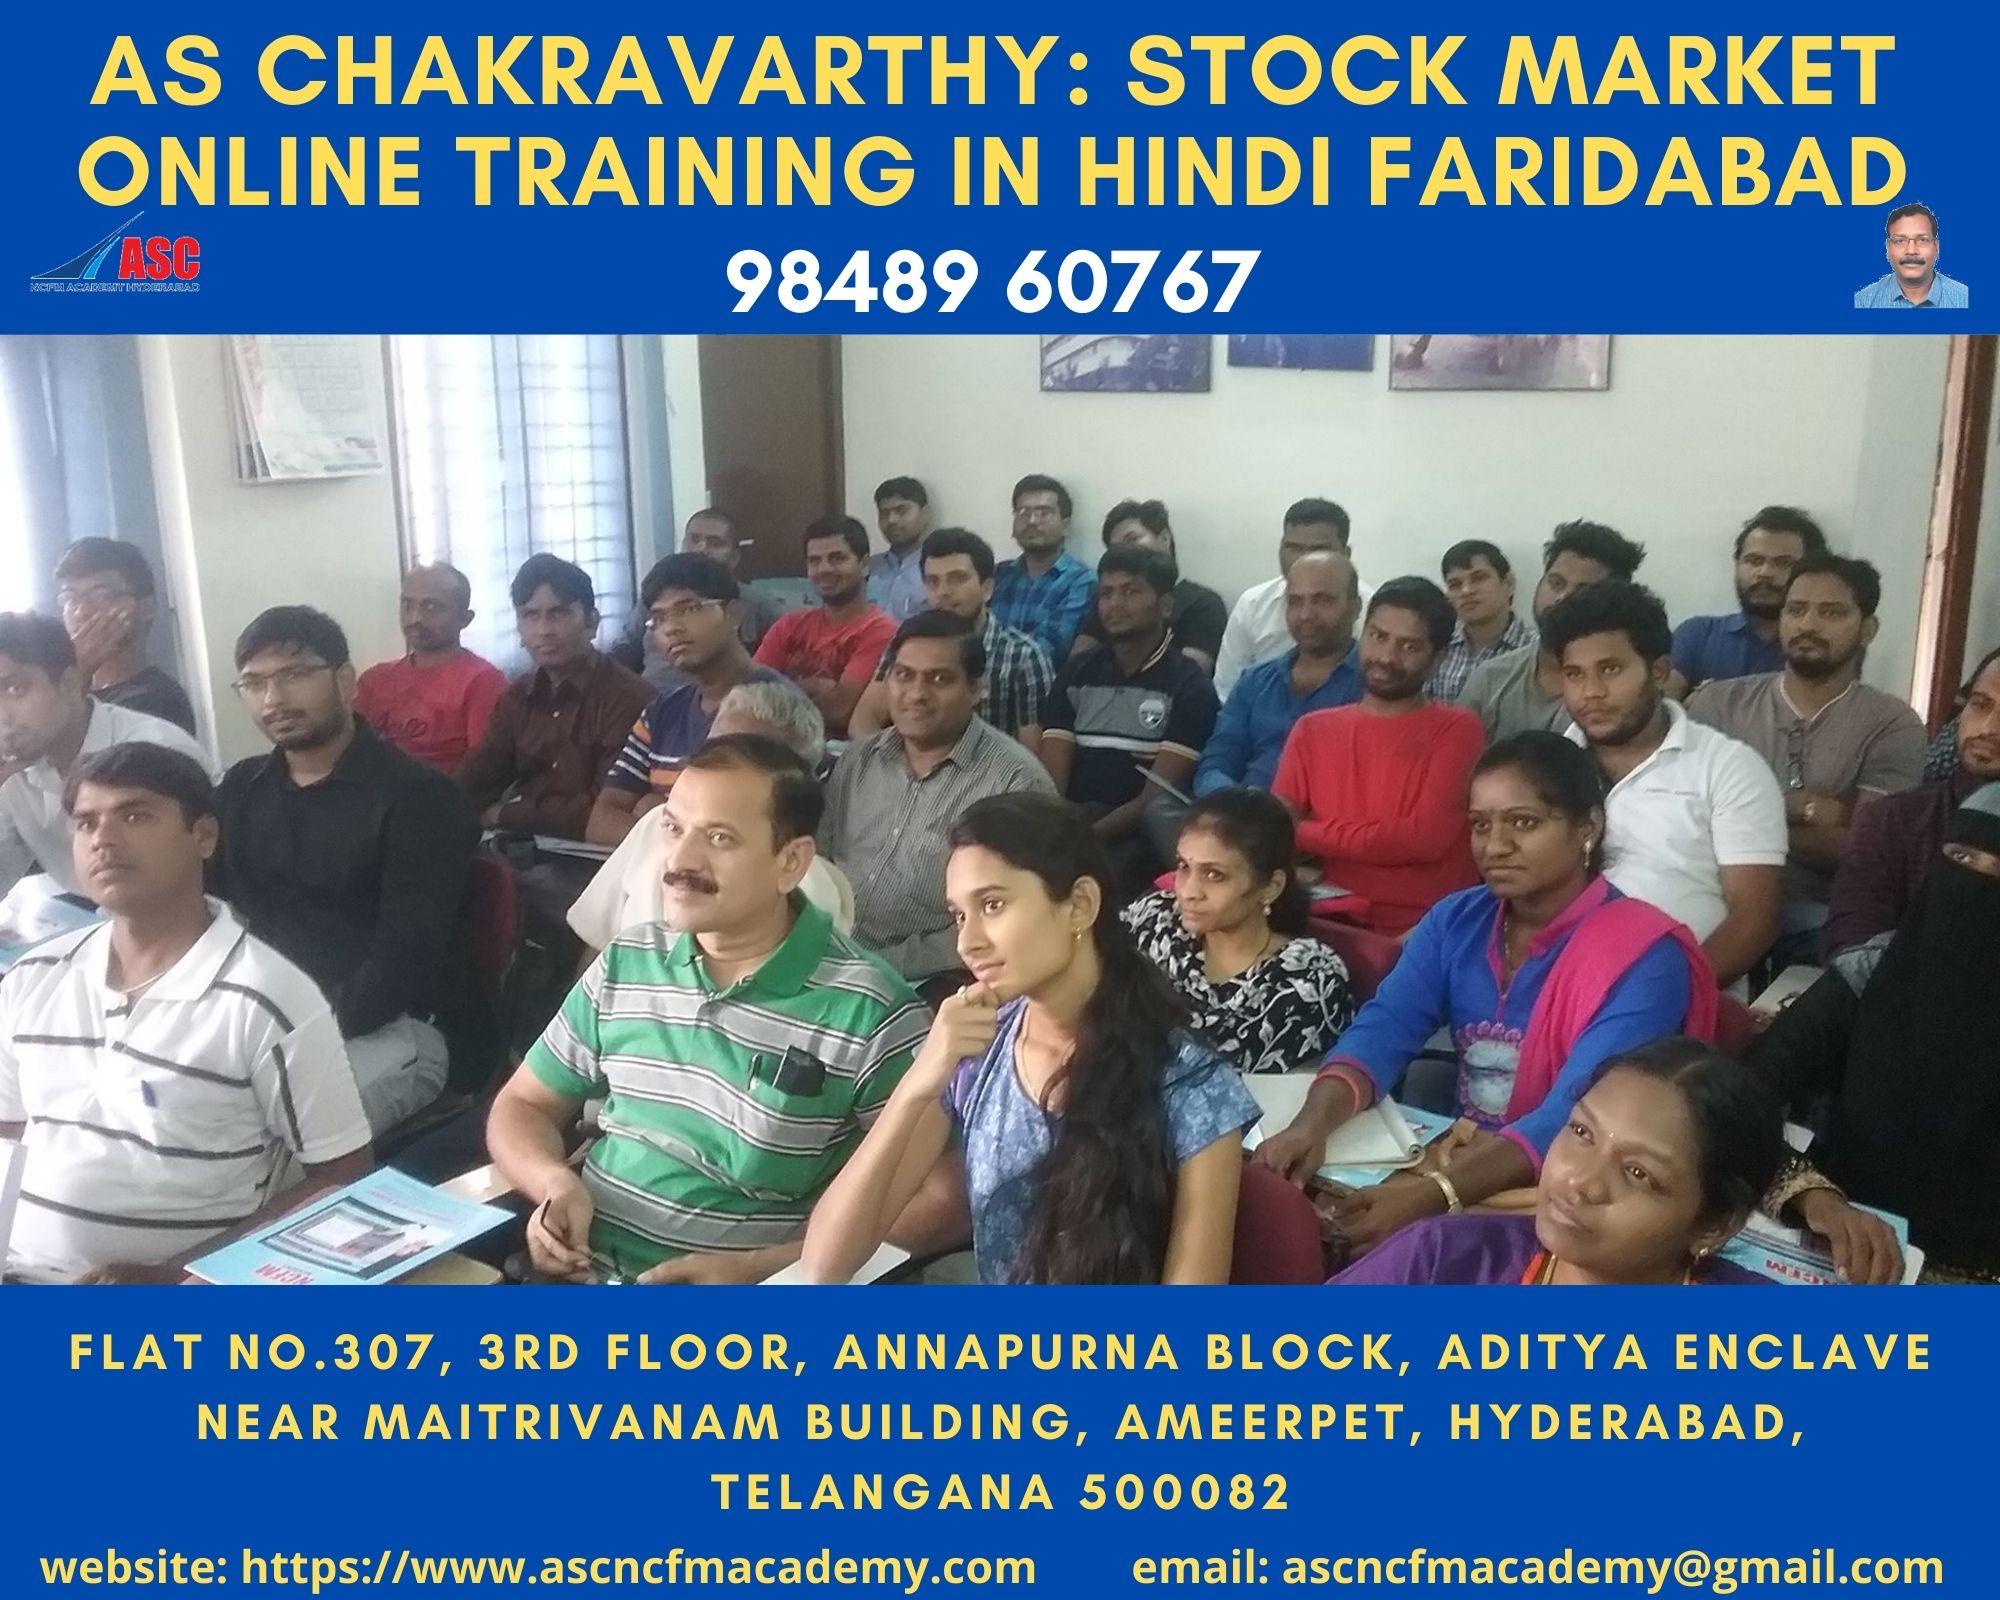 Online Stock Market Technical in Hindi Faridabad